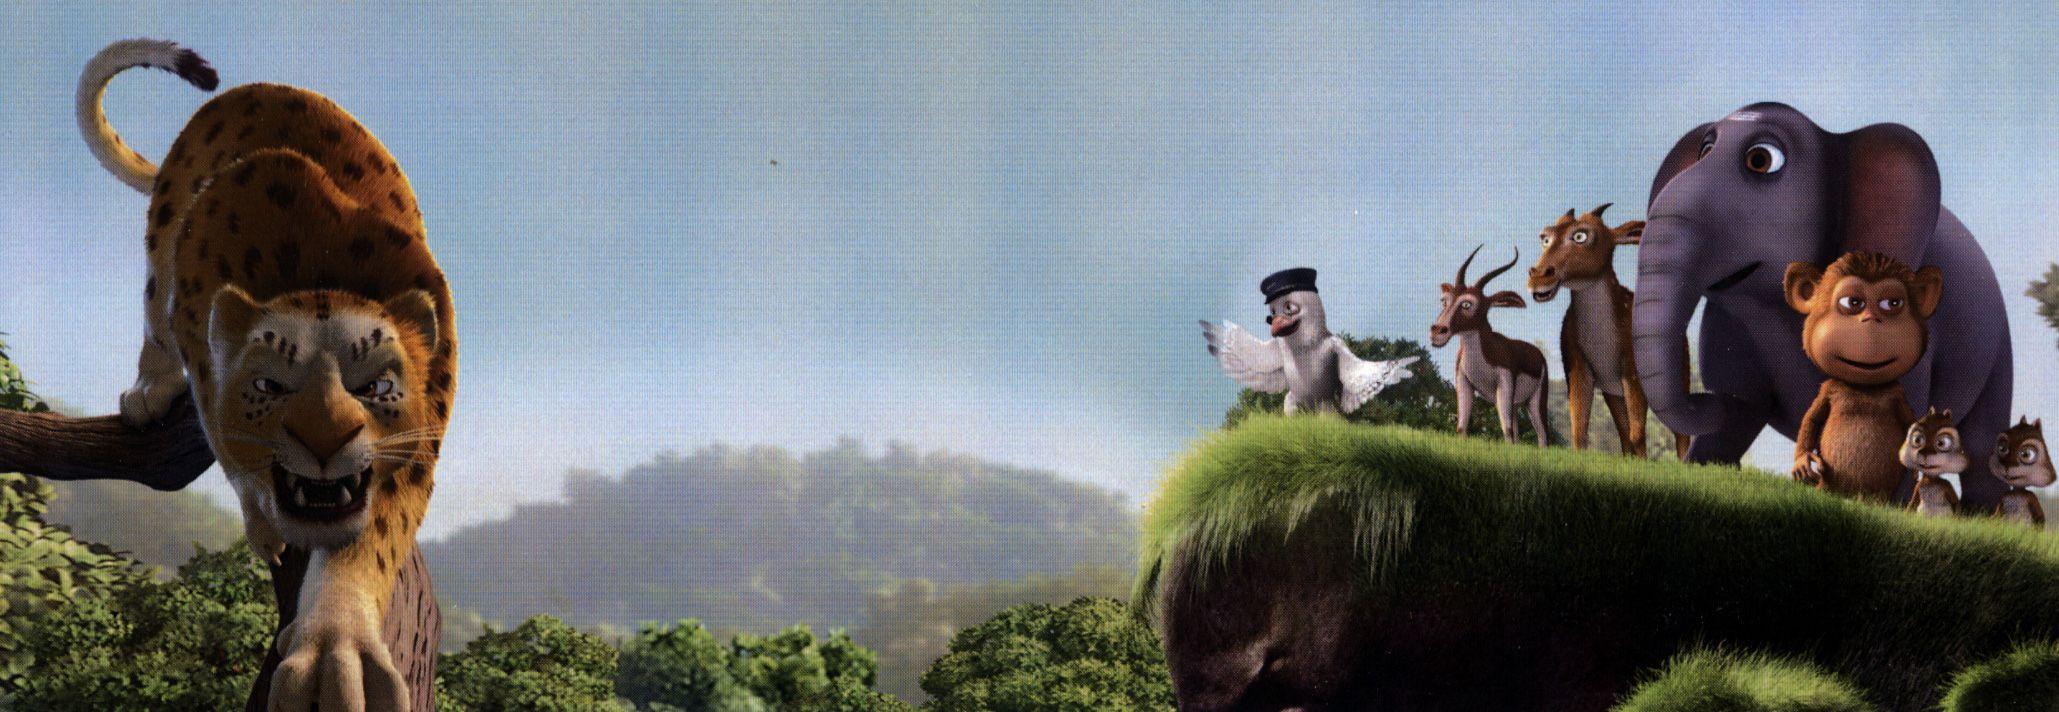 delhi safari movie poster synopsis images collider